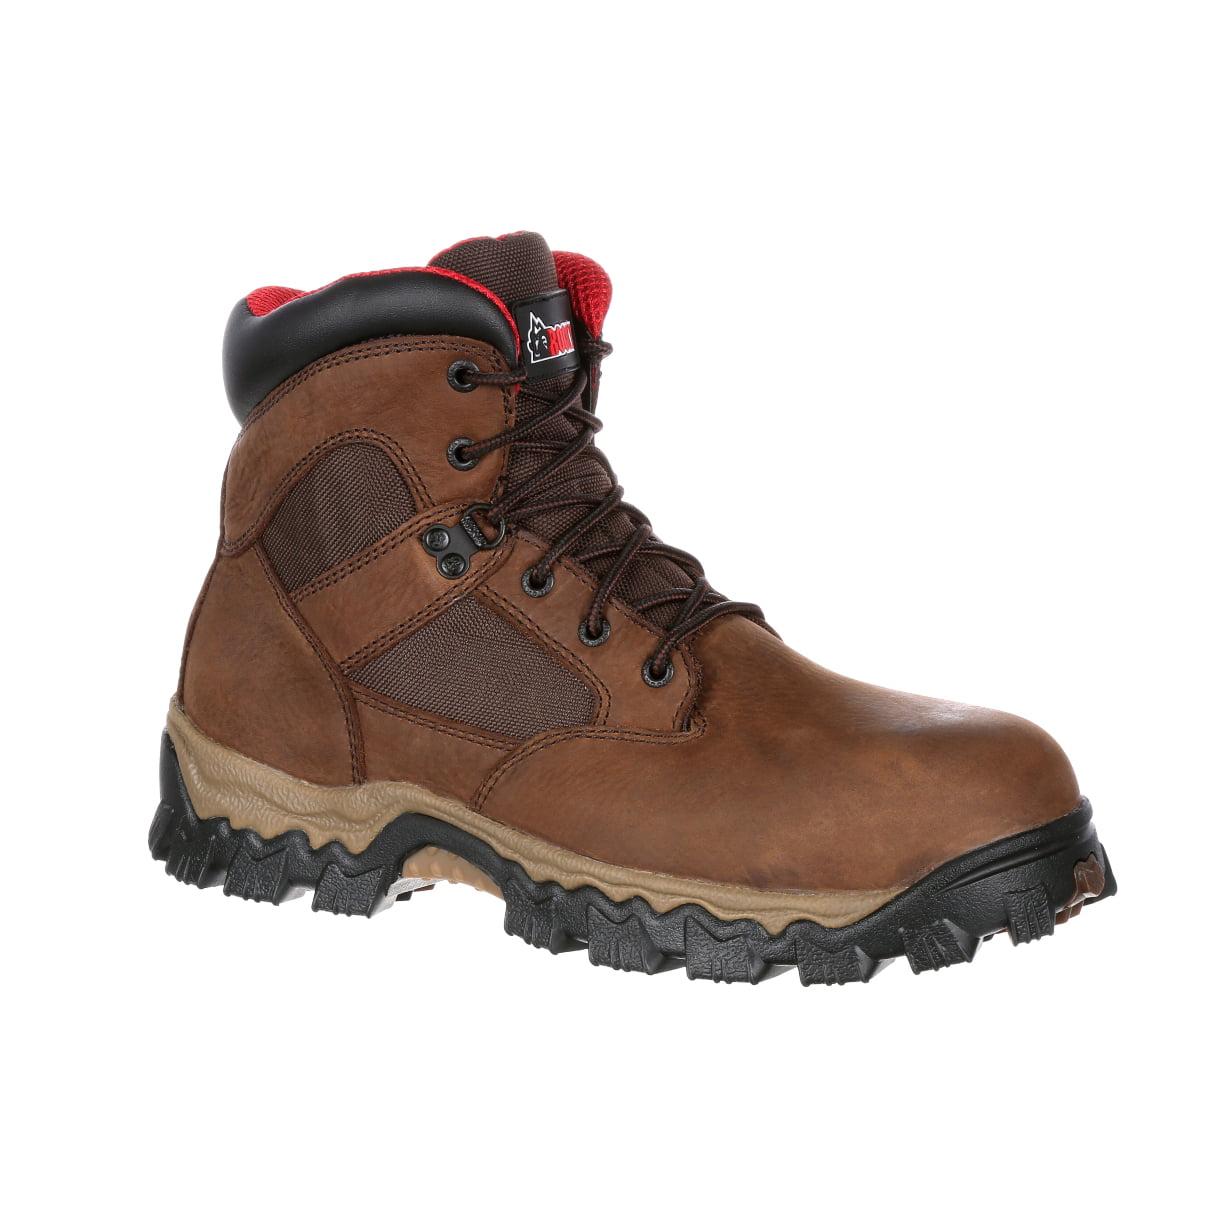 Rocky Men's AlphaForce 6'' Composite Toe Waterproof Work Boots Brown Leather 11.5 M by ROCKY BRANDS